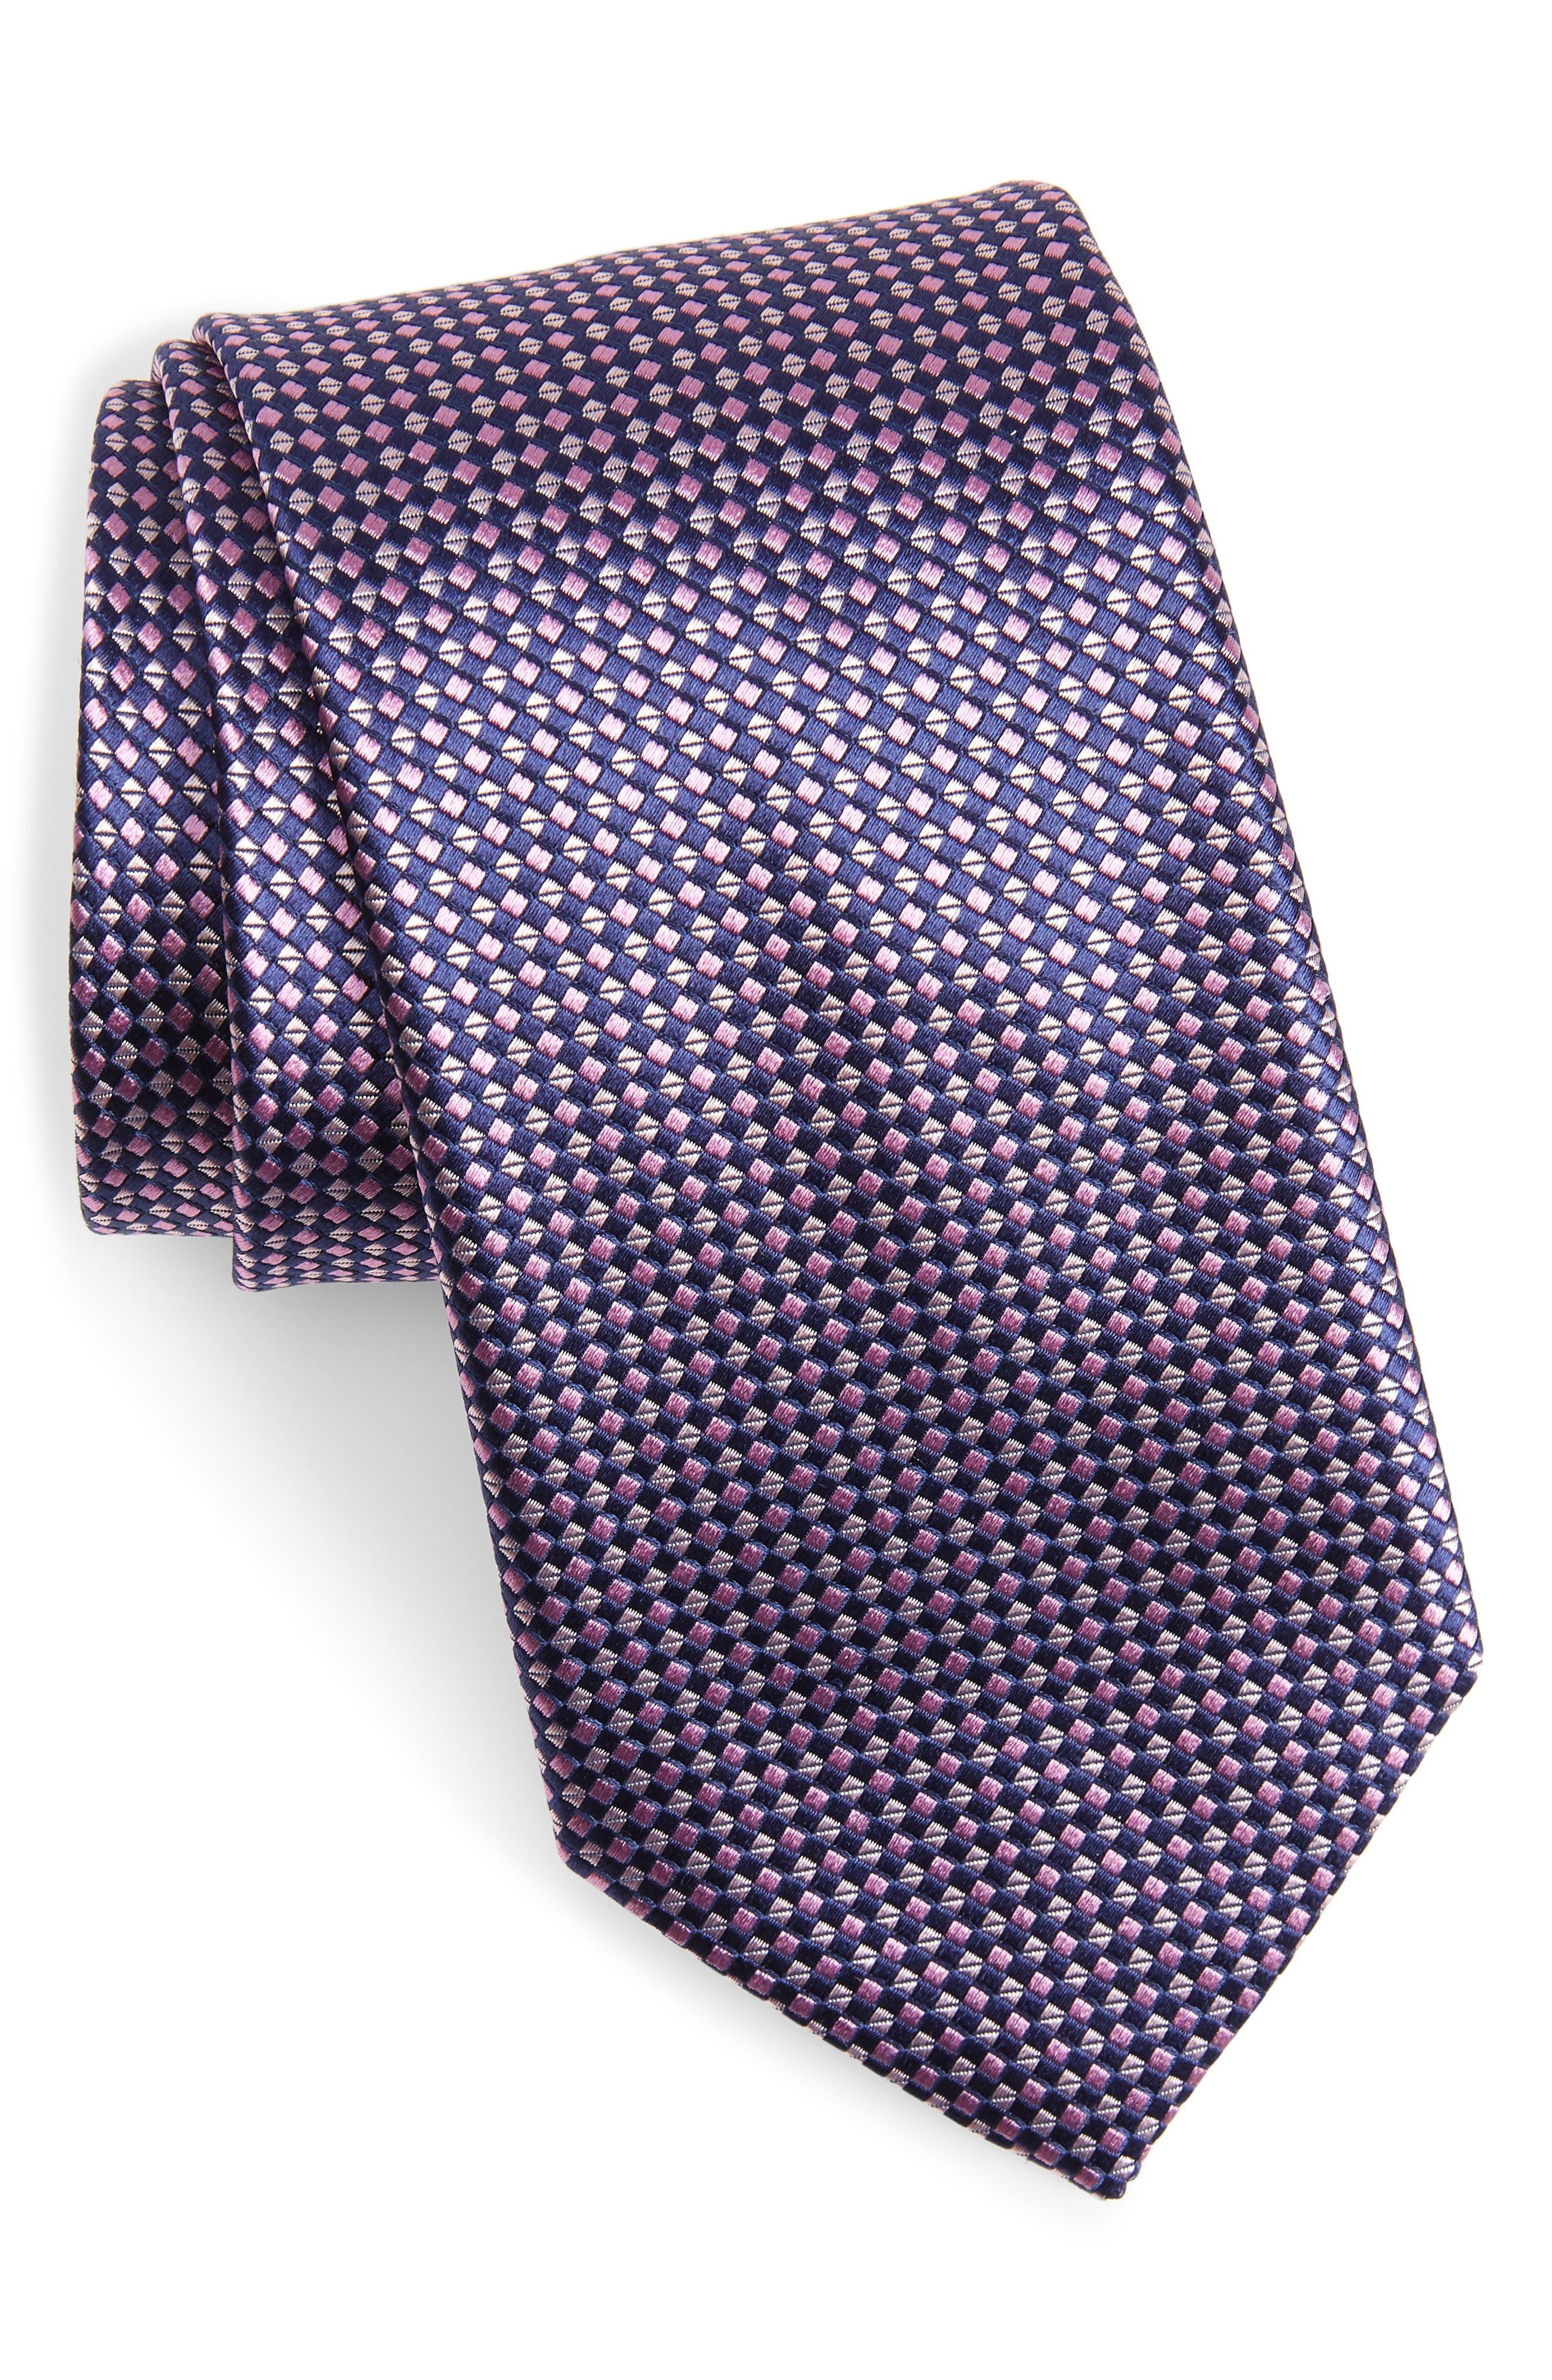 CANALI, Geometric Silk Tie, Main thumbnail 1, color, PINK